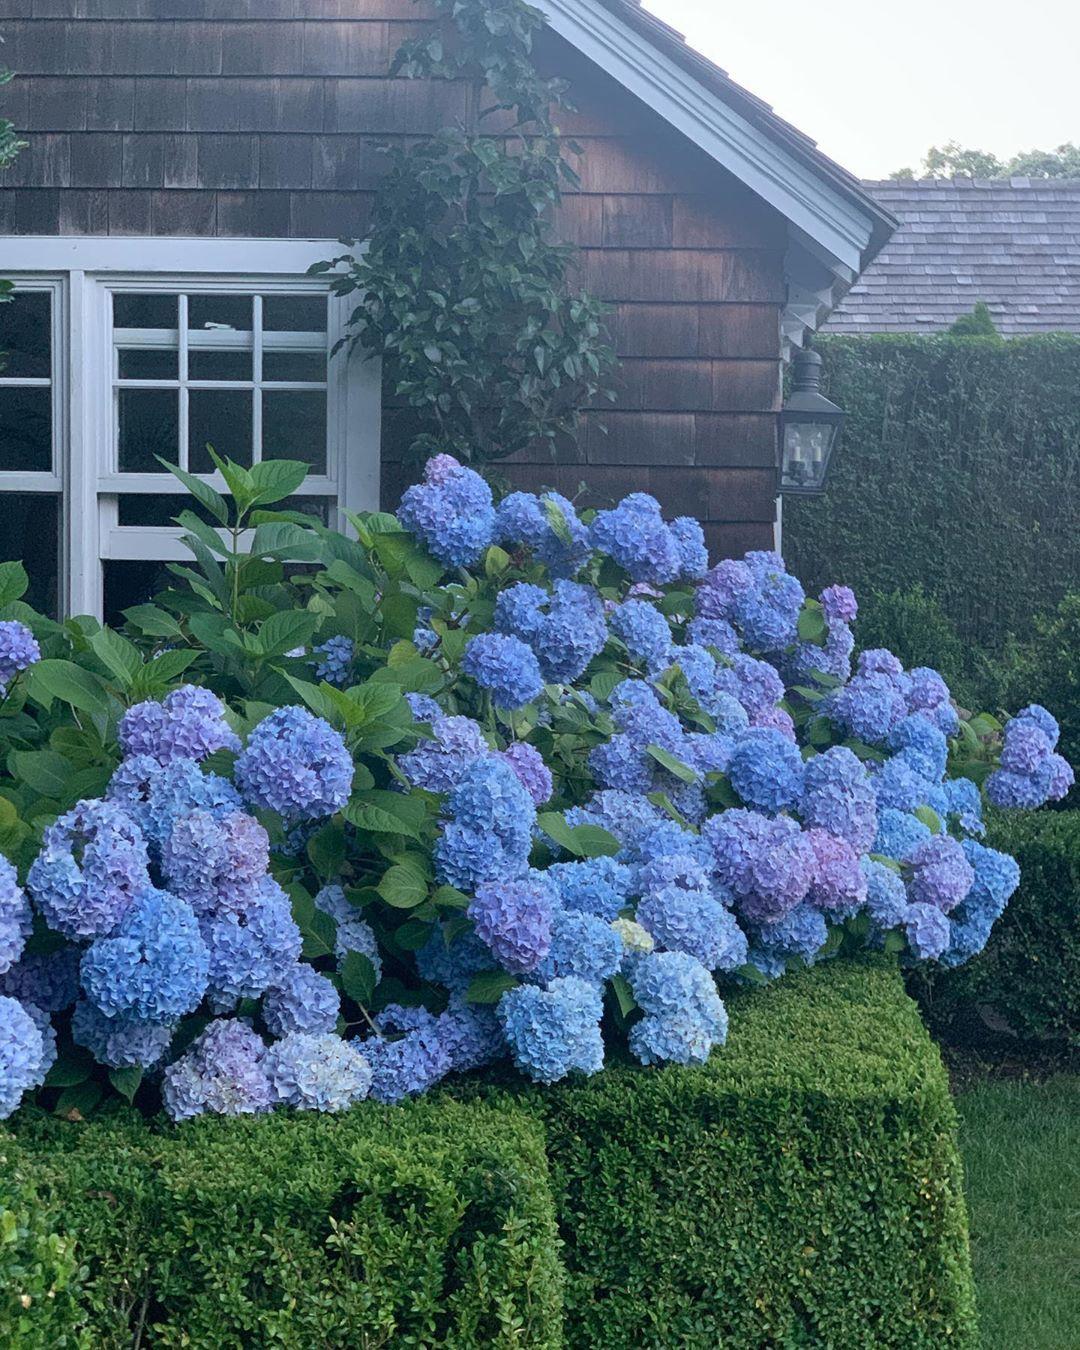 Gregory Shano S Instagram Photo Hydrangea Heaven Hamptons Easthampton Hydrangeas Home In 2020 Hydrangea Instagram Instagram Photo